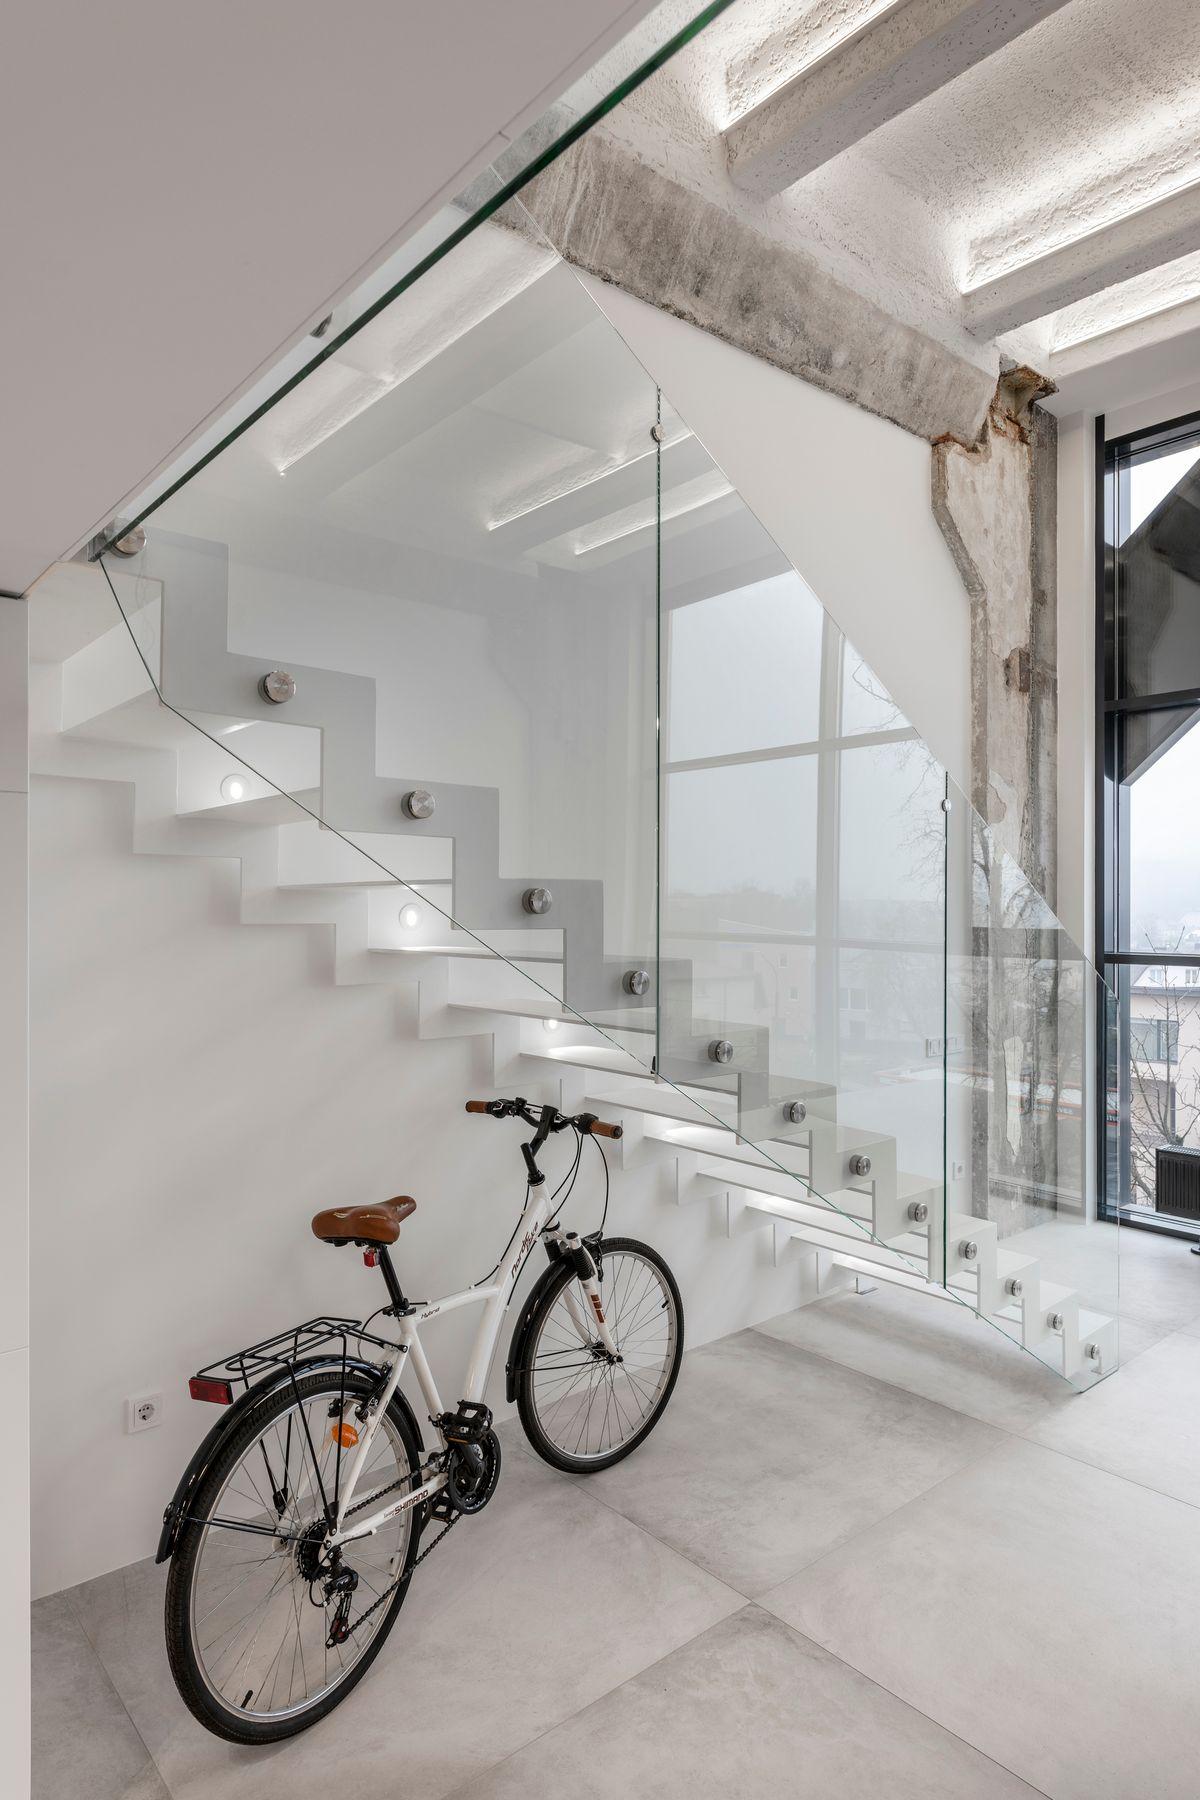 Лофт площадью 64 кв. метра в Литве